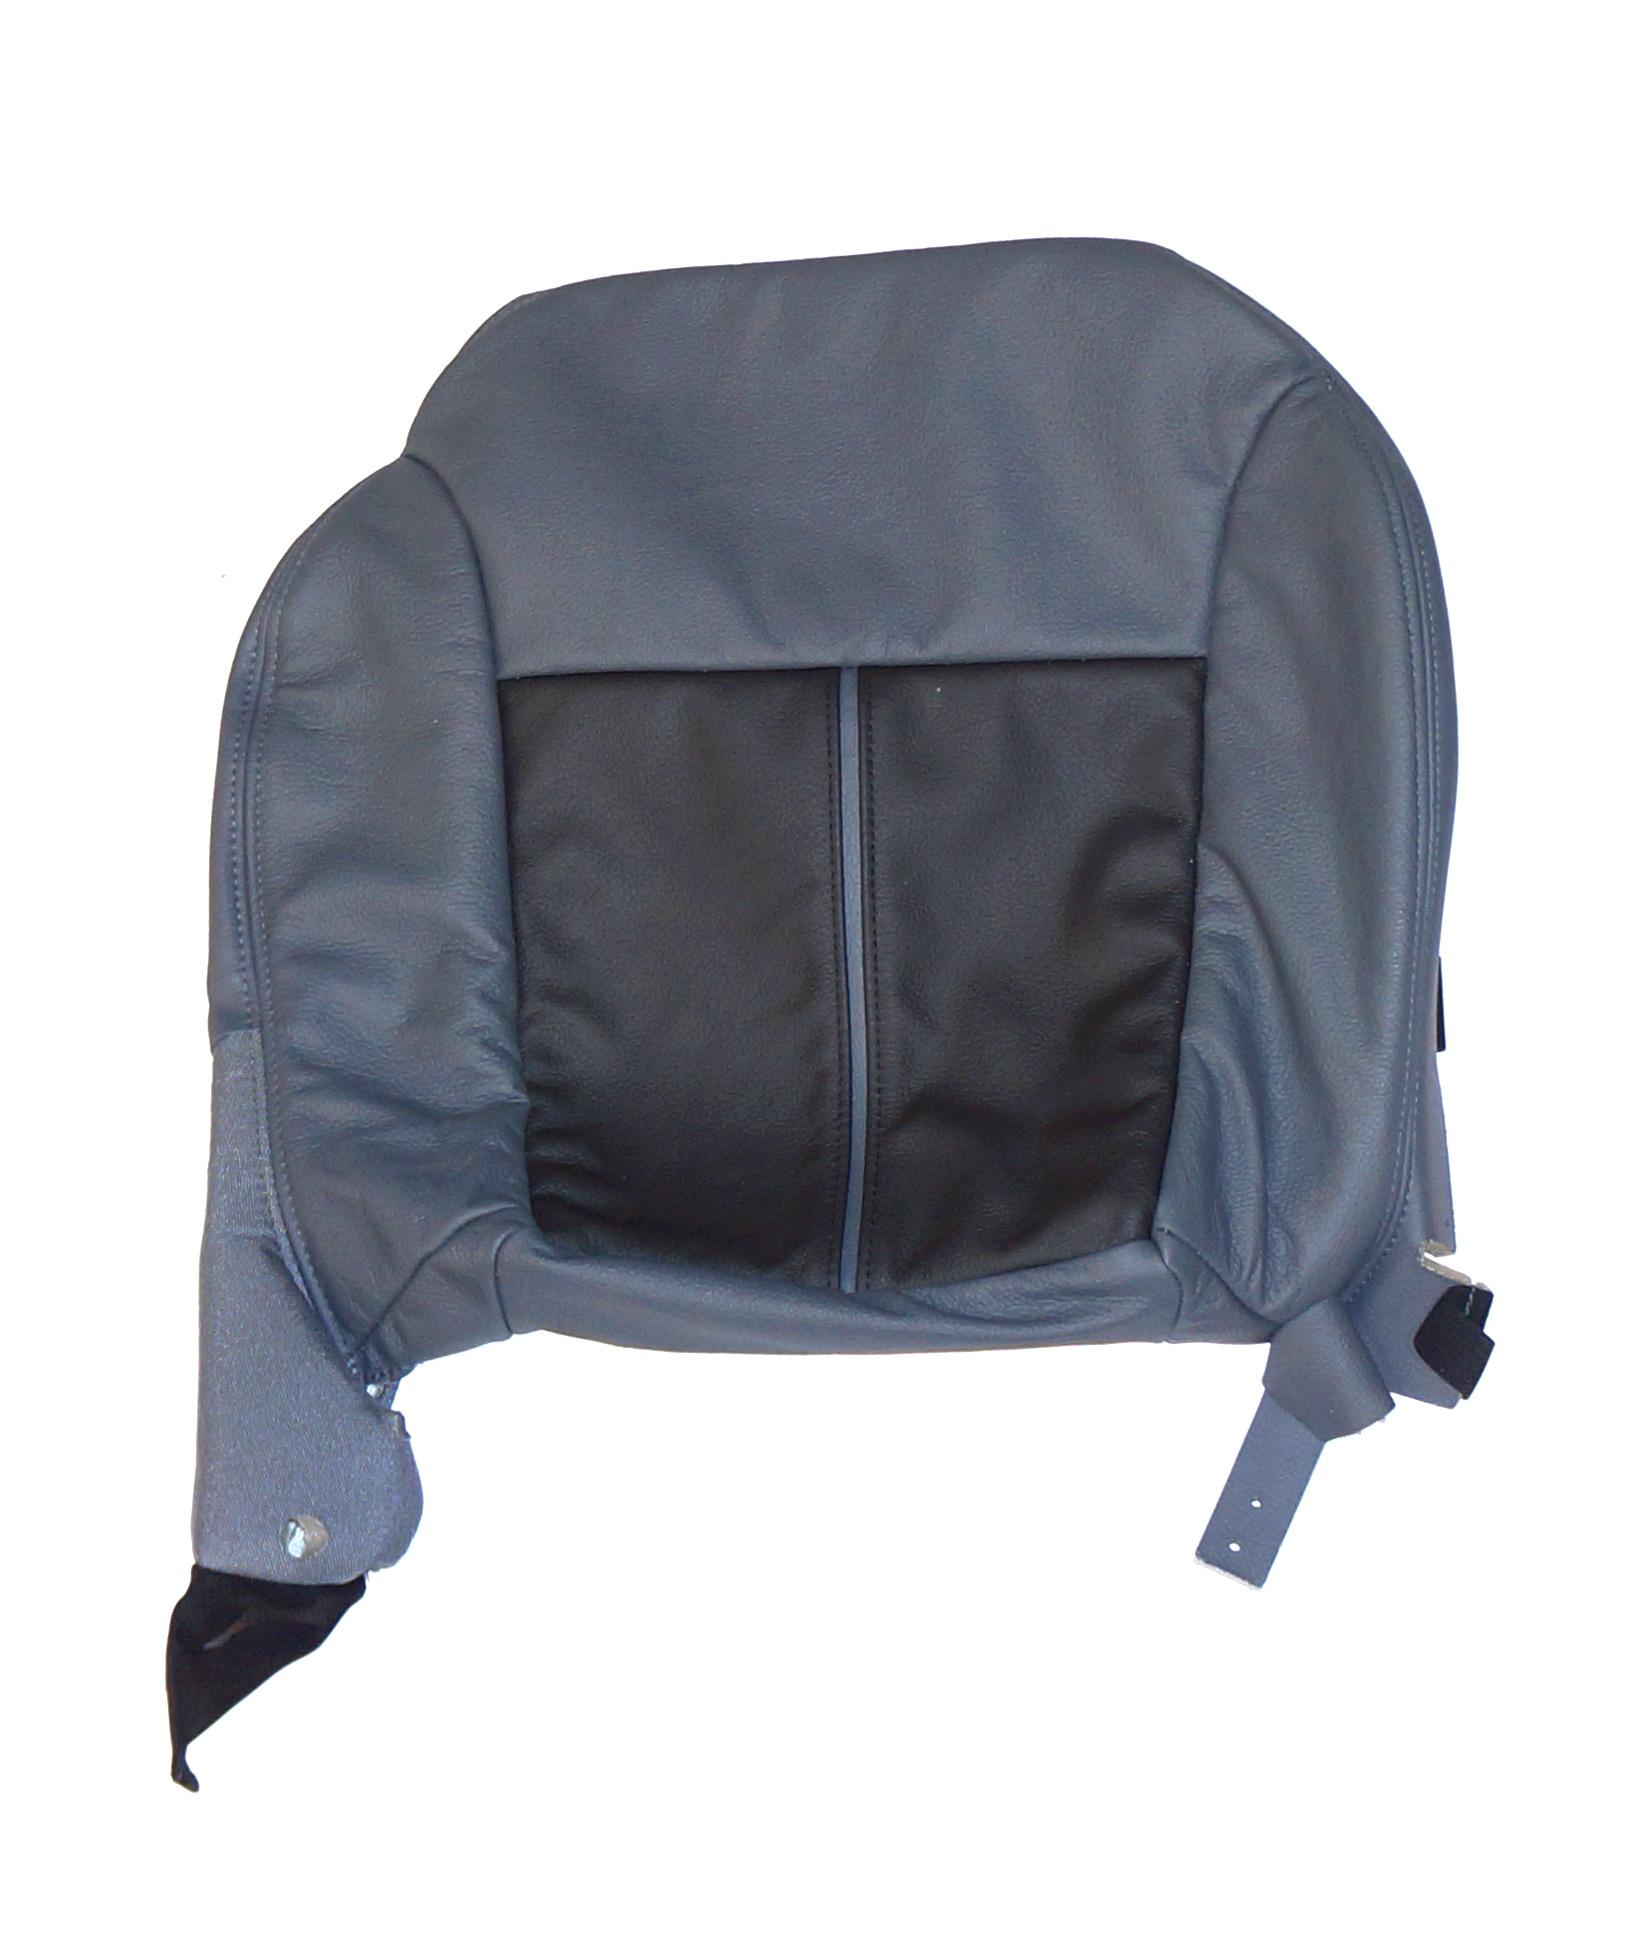 12765329 SAAB K06 Seat Cover Front Bottom RH Passenger